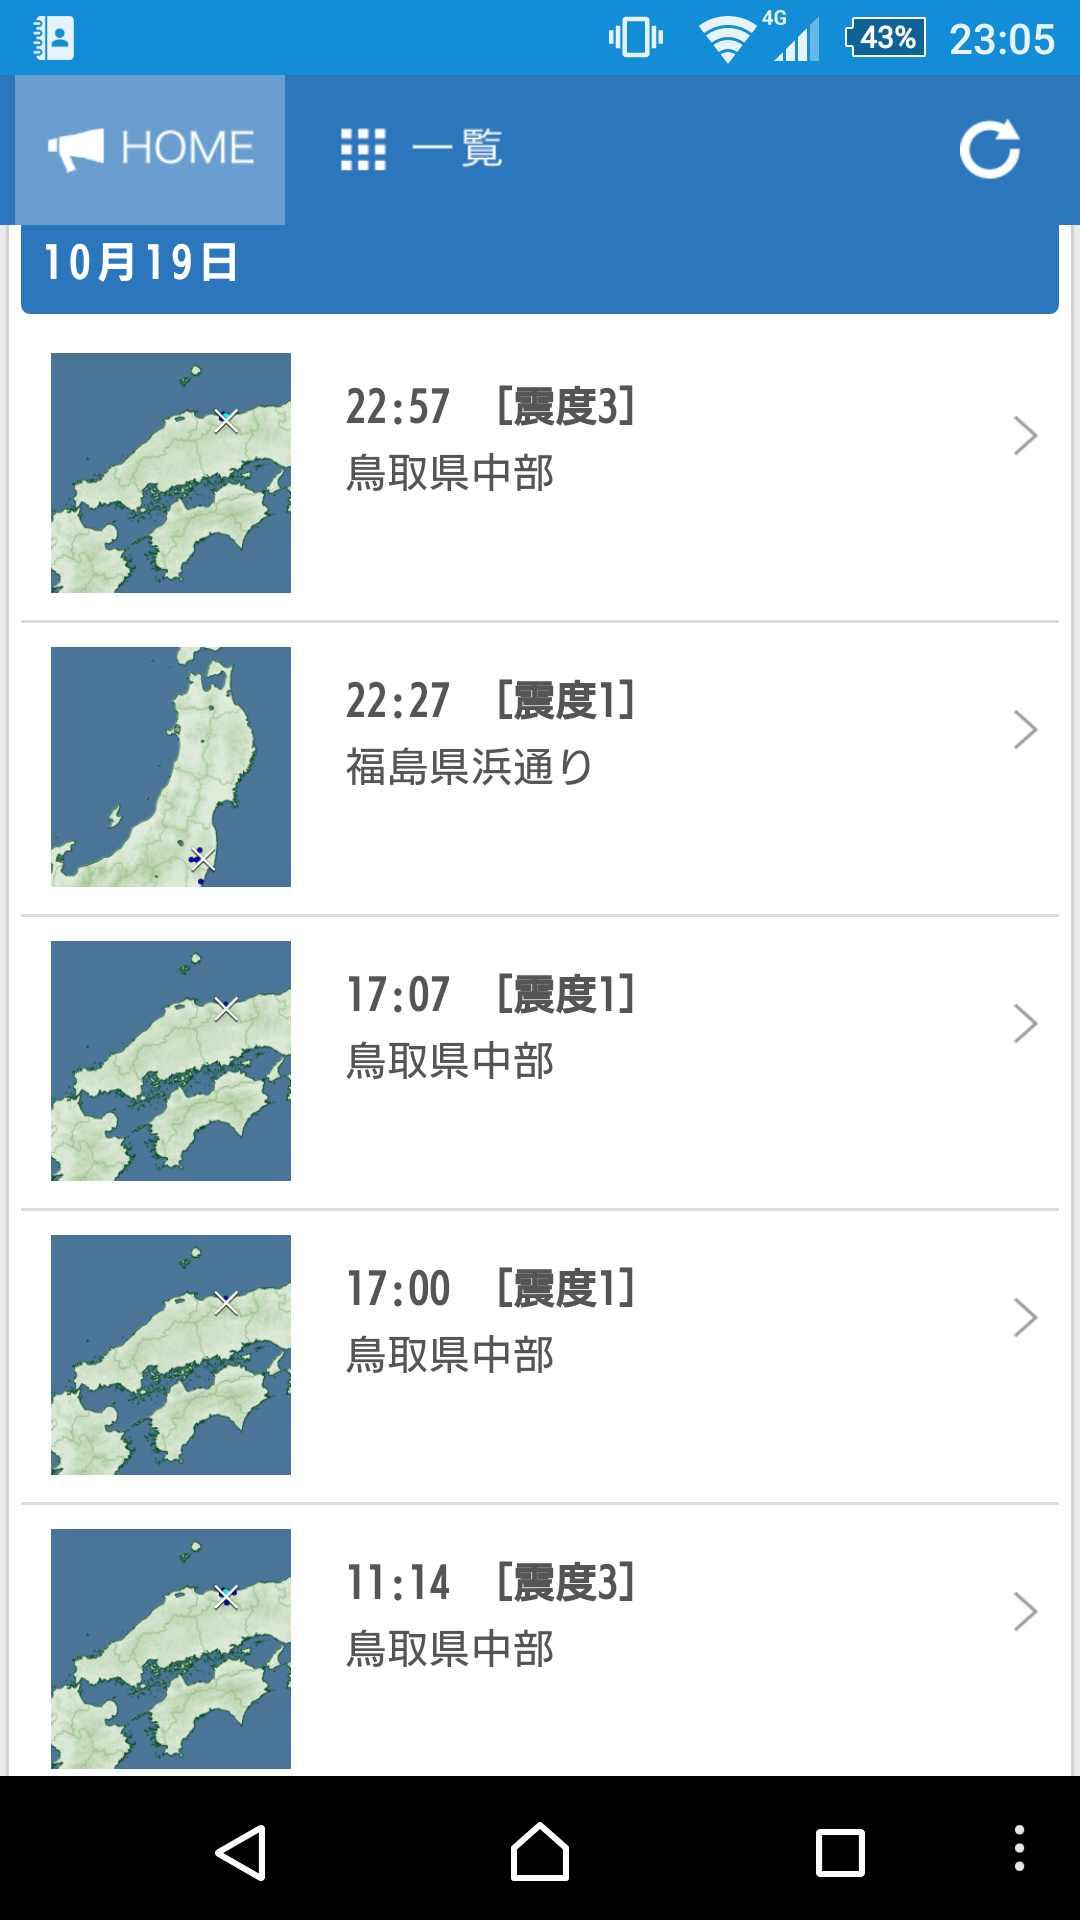 http://blog-imgs-81.fc2.com/o/k/a/okarutojishinyogen/news4vip_1445263860_101.jpg